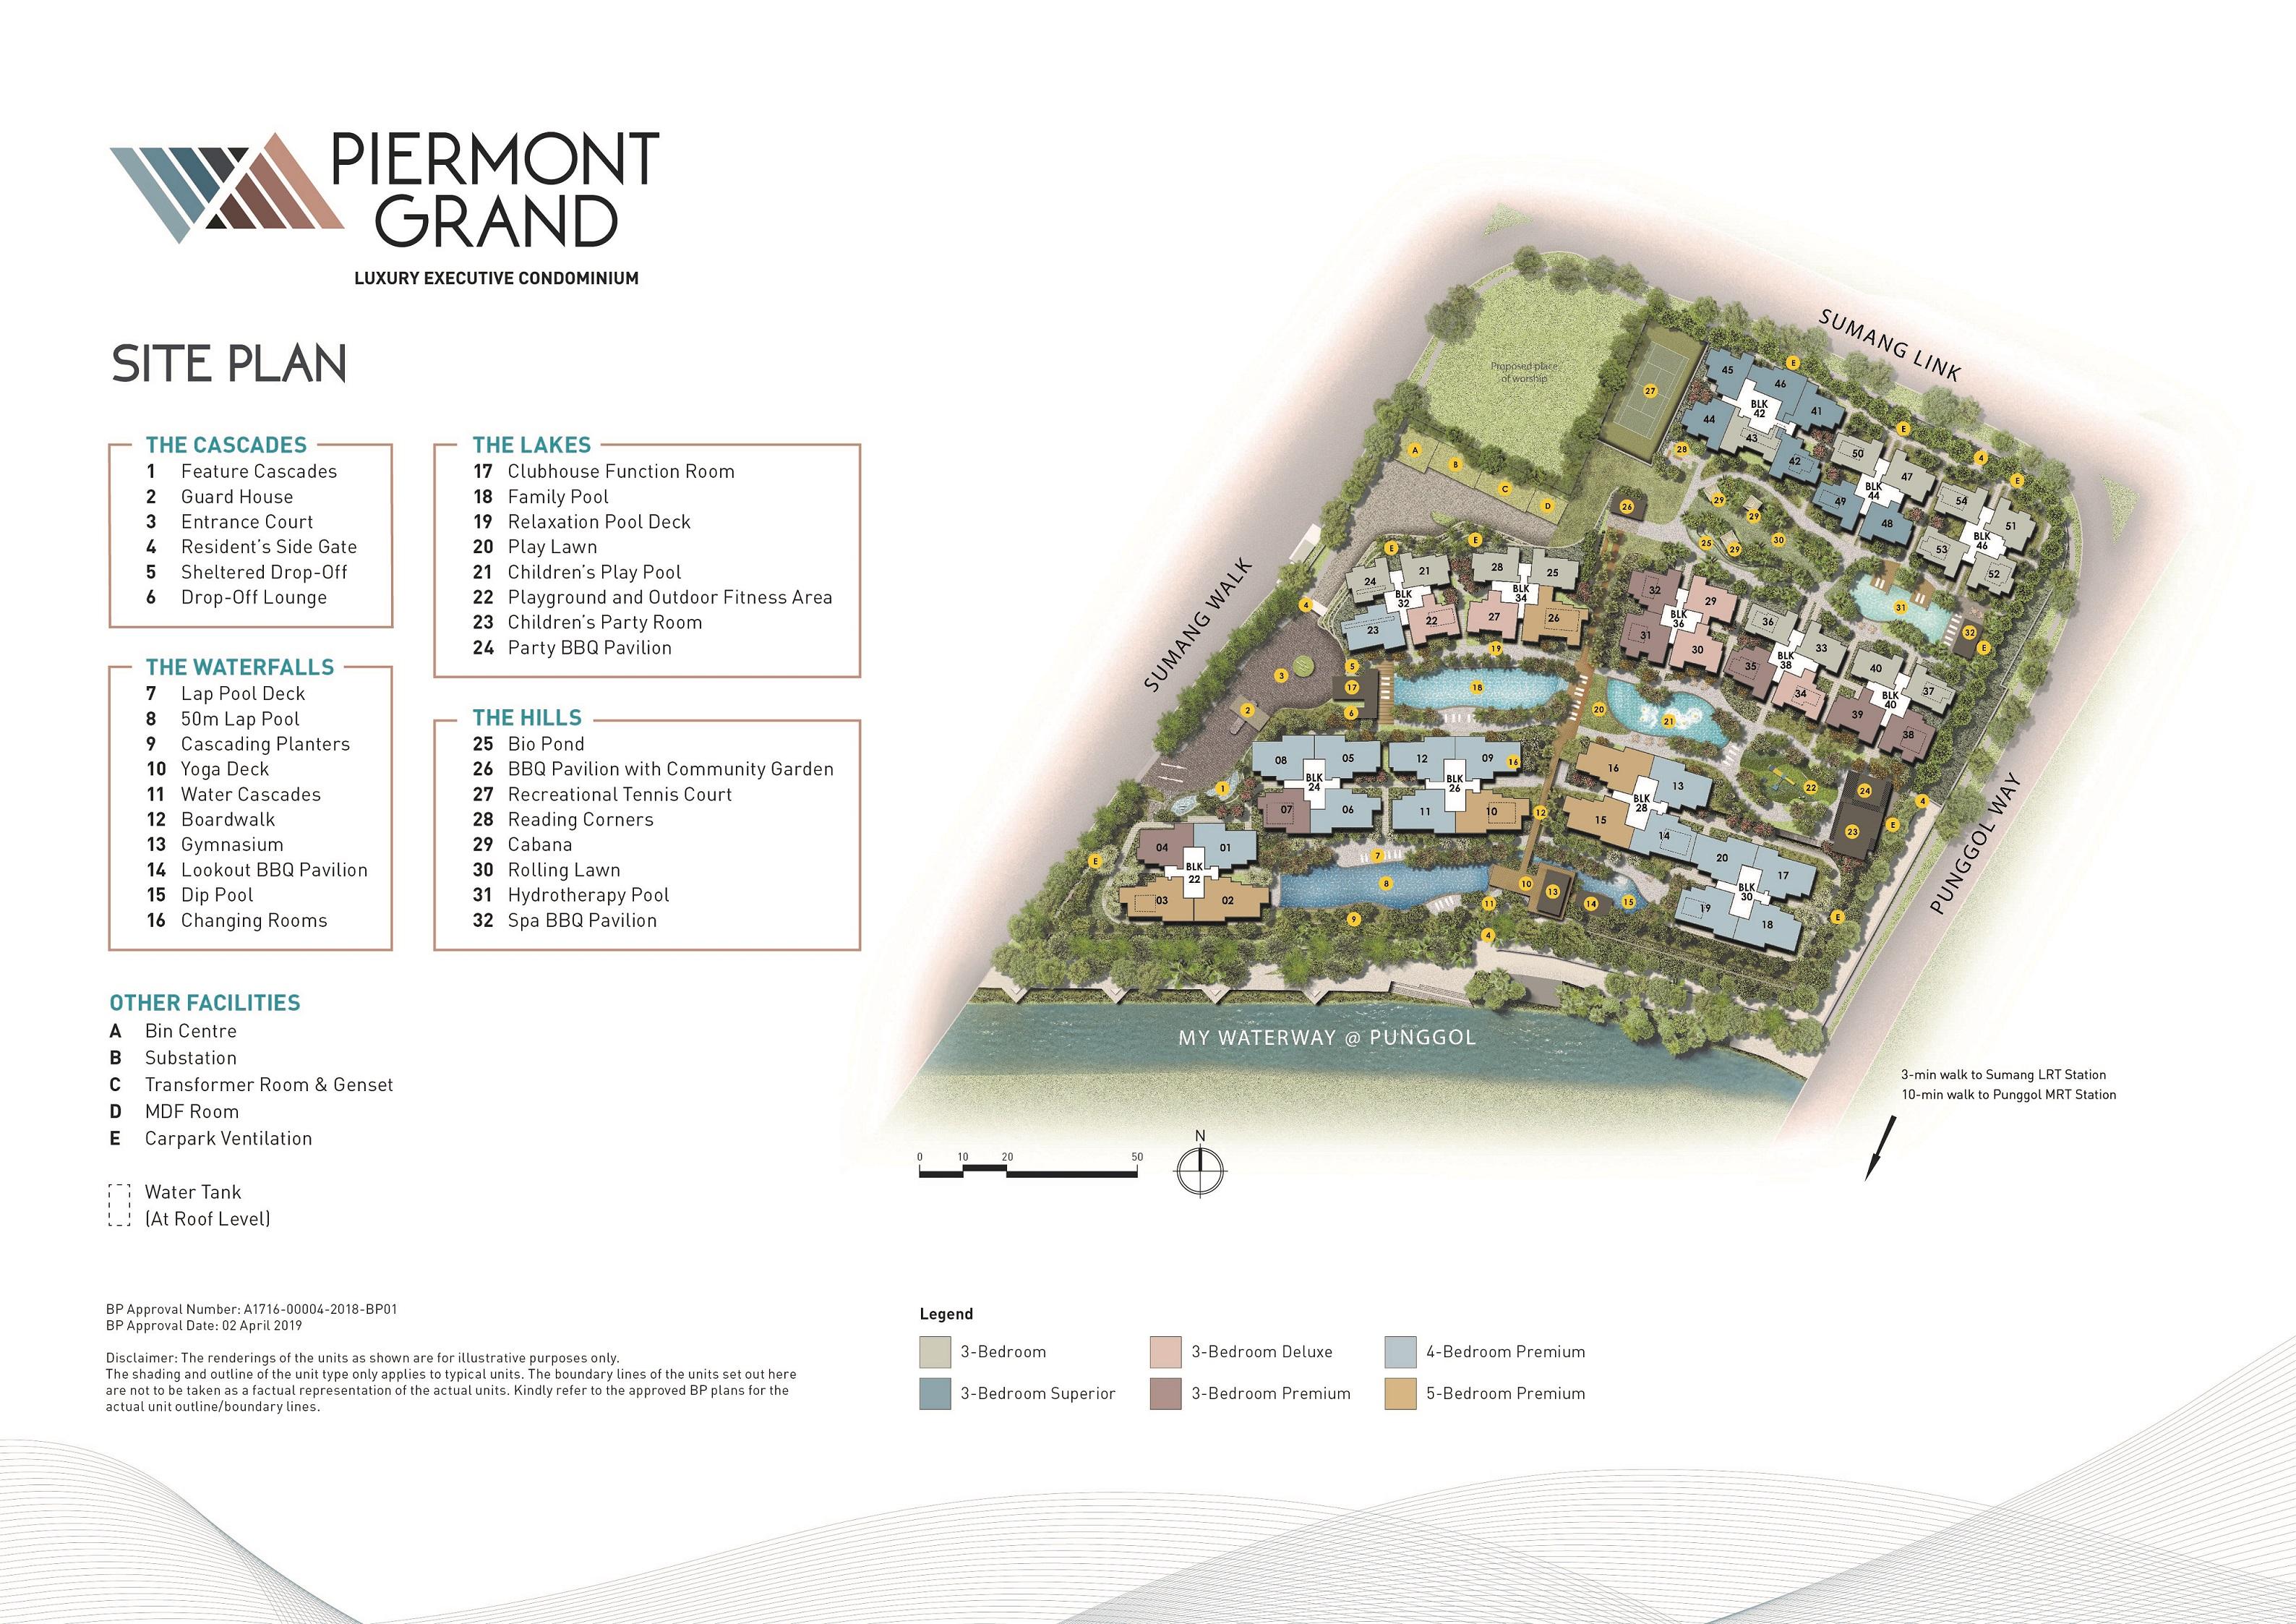 Piermont Grand site plan